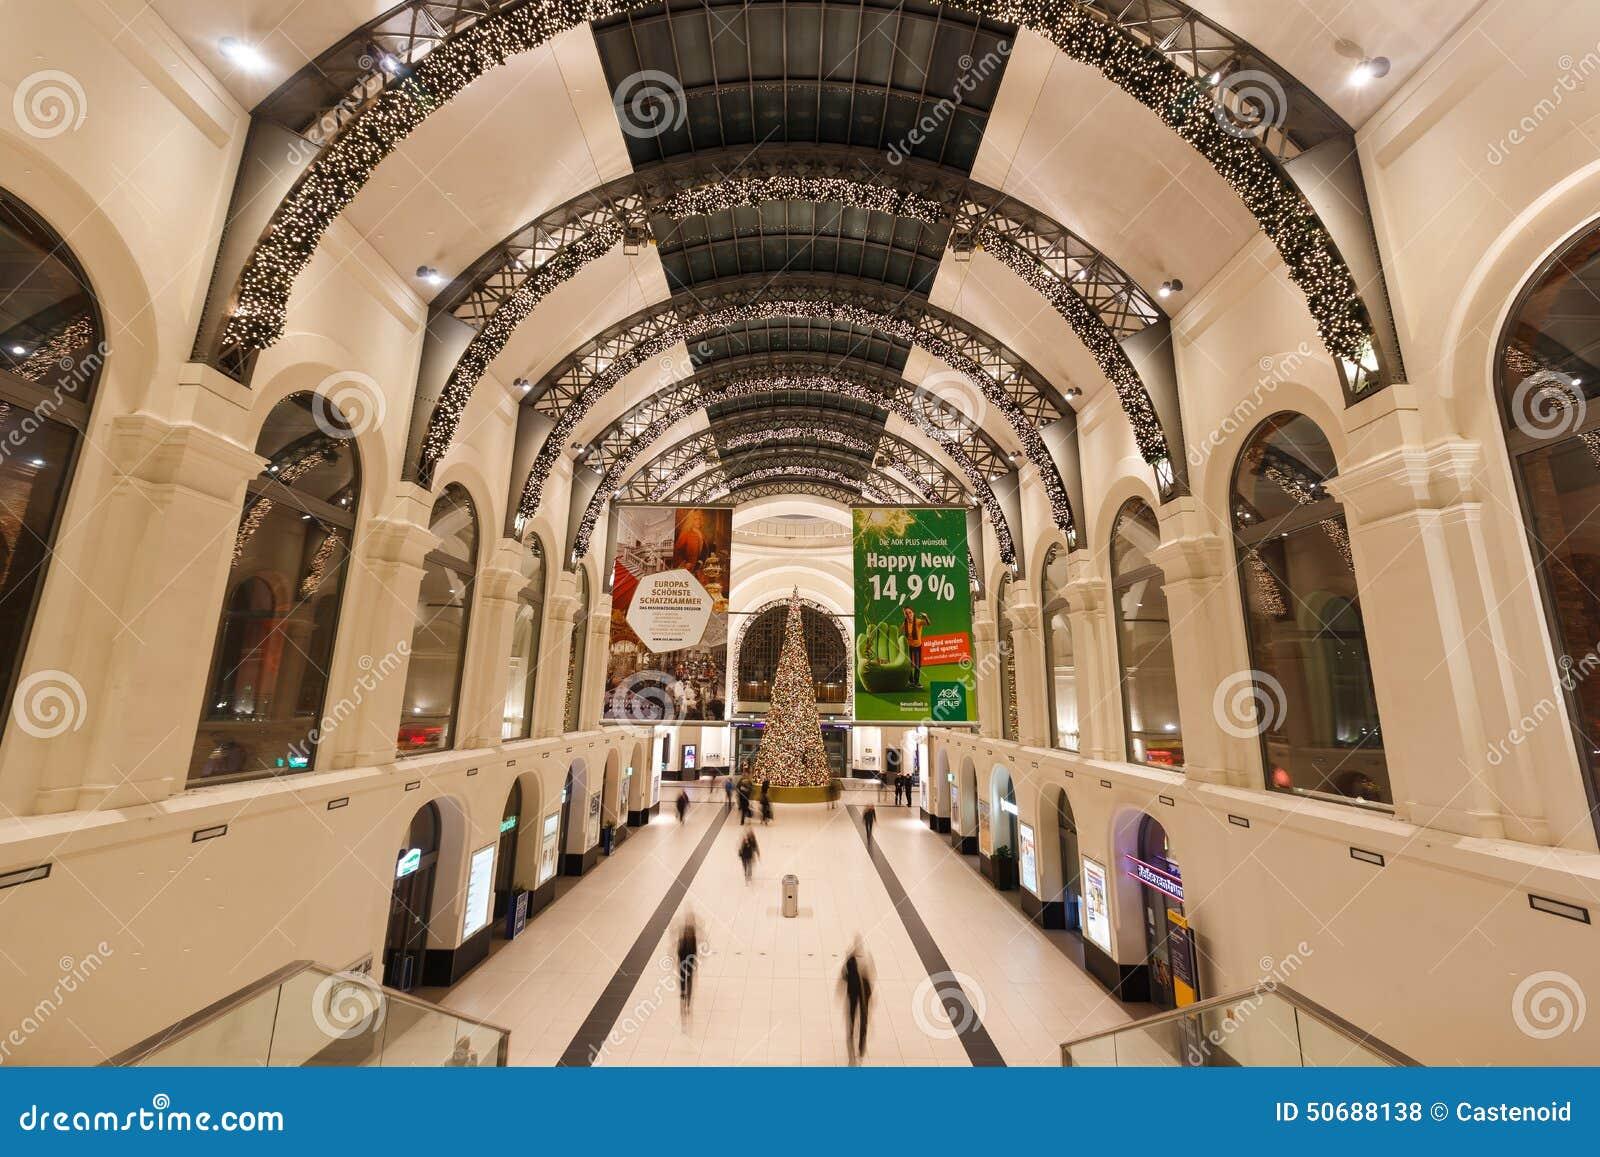 Download 德累斯顿中央驻地 编辑类库存照片. 图片 包括有 拱道, 里面, 公共, 圣诞节, 最高限额, 广场, 德累斯顿 - 50688138